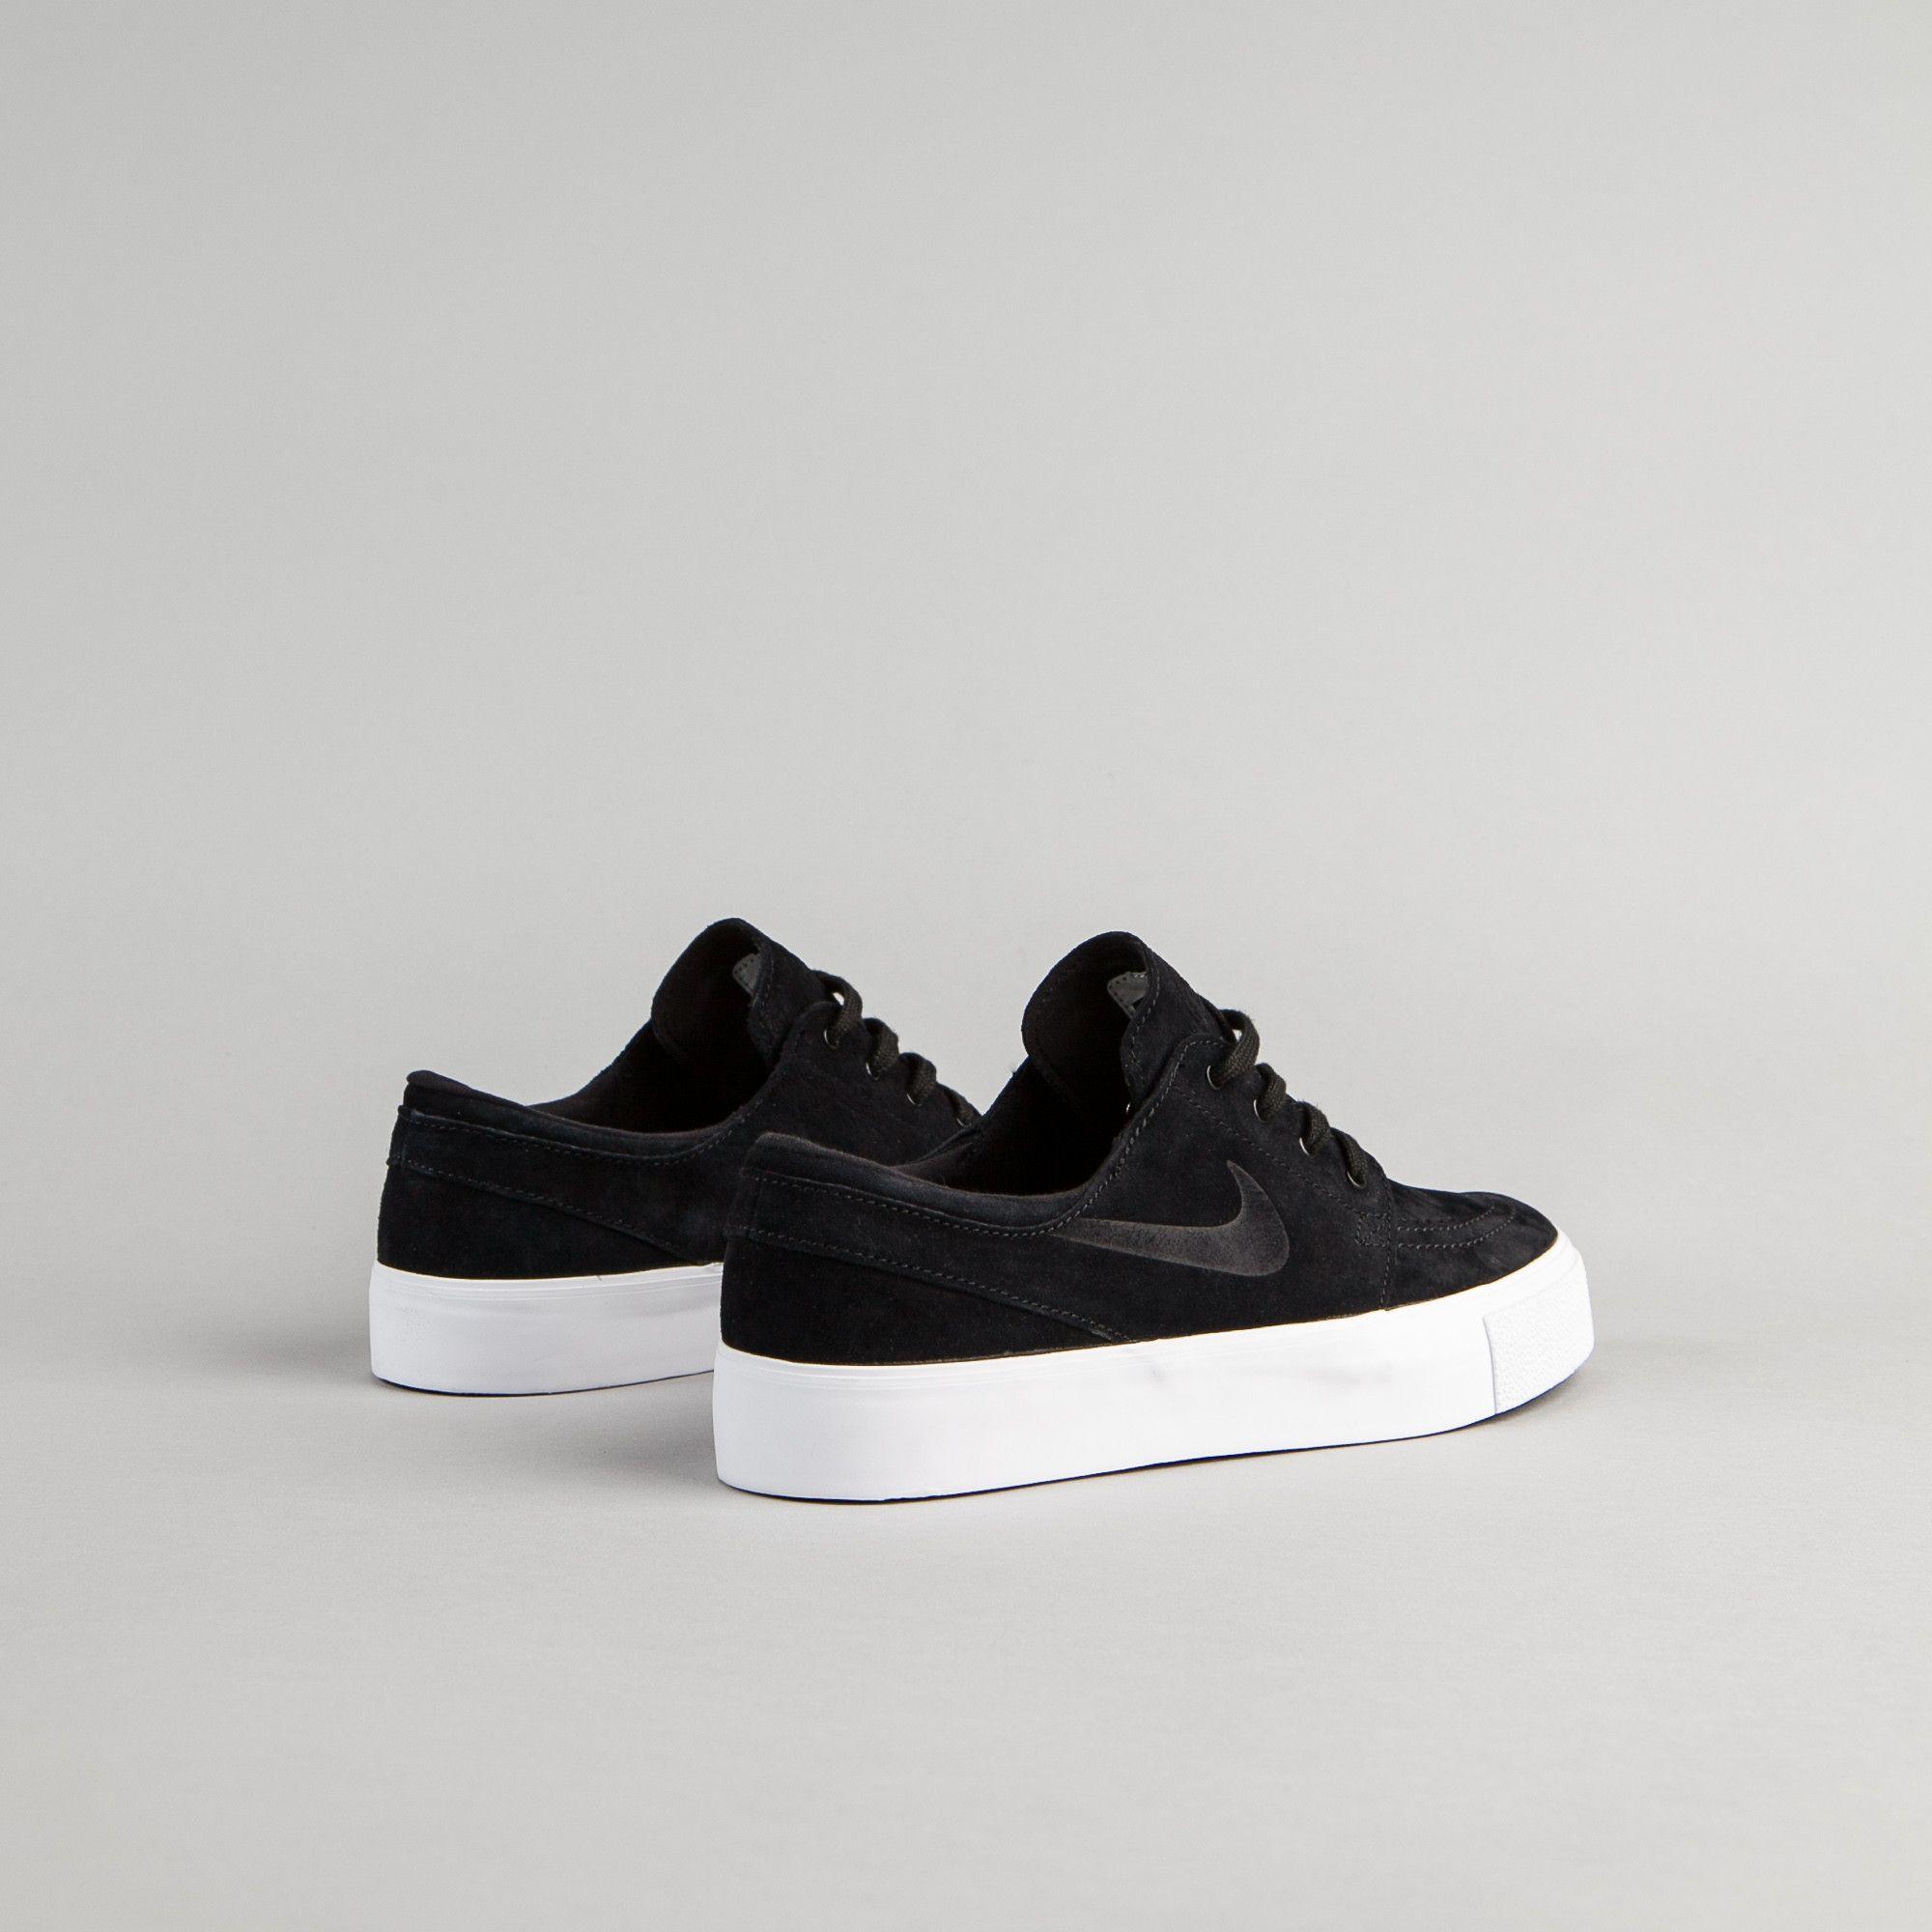 Nike SB Stefan Janoski Premium HT Shoes - Black / Black - White